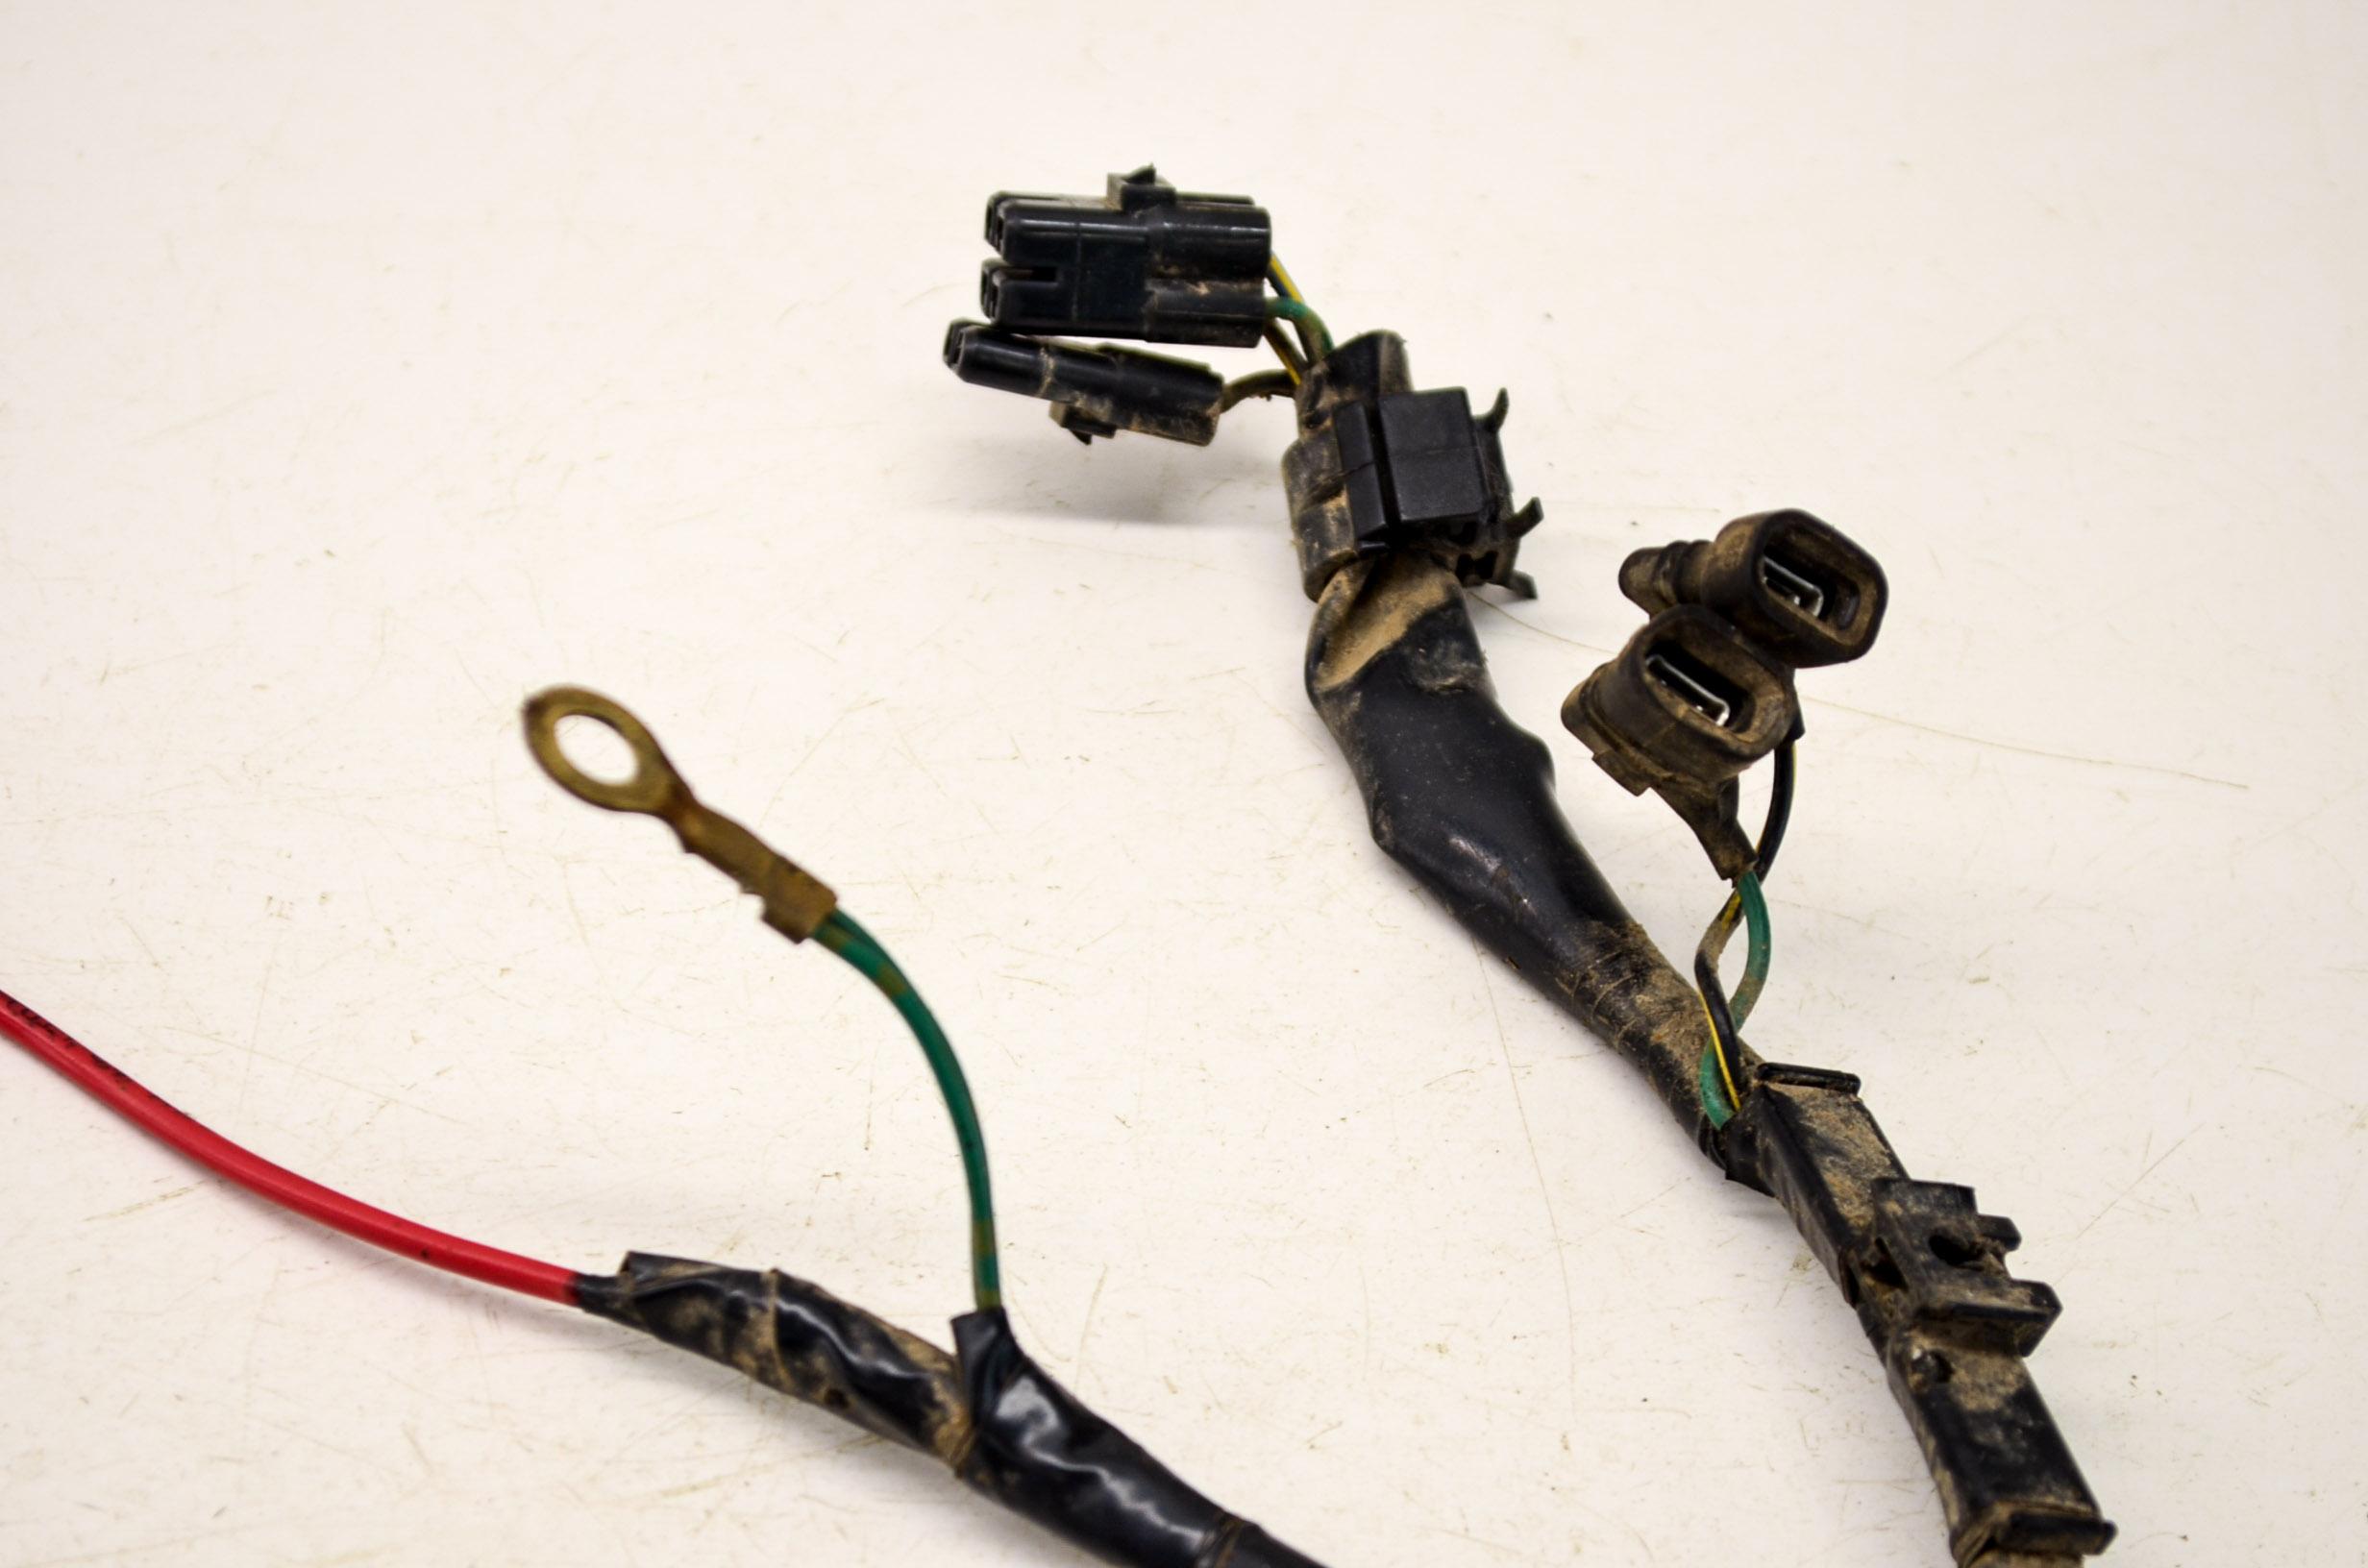 00 Honda Xr100r Wire Harness Electrical Wiring Ebay Xr80 Gallery Image